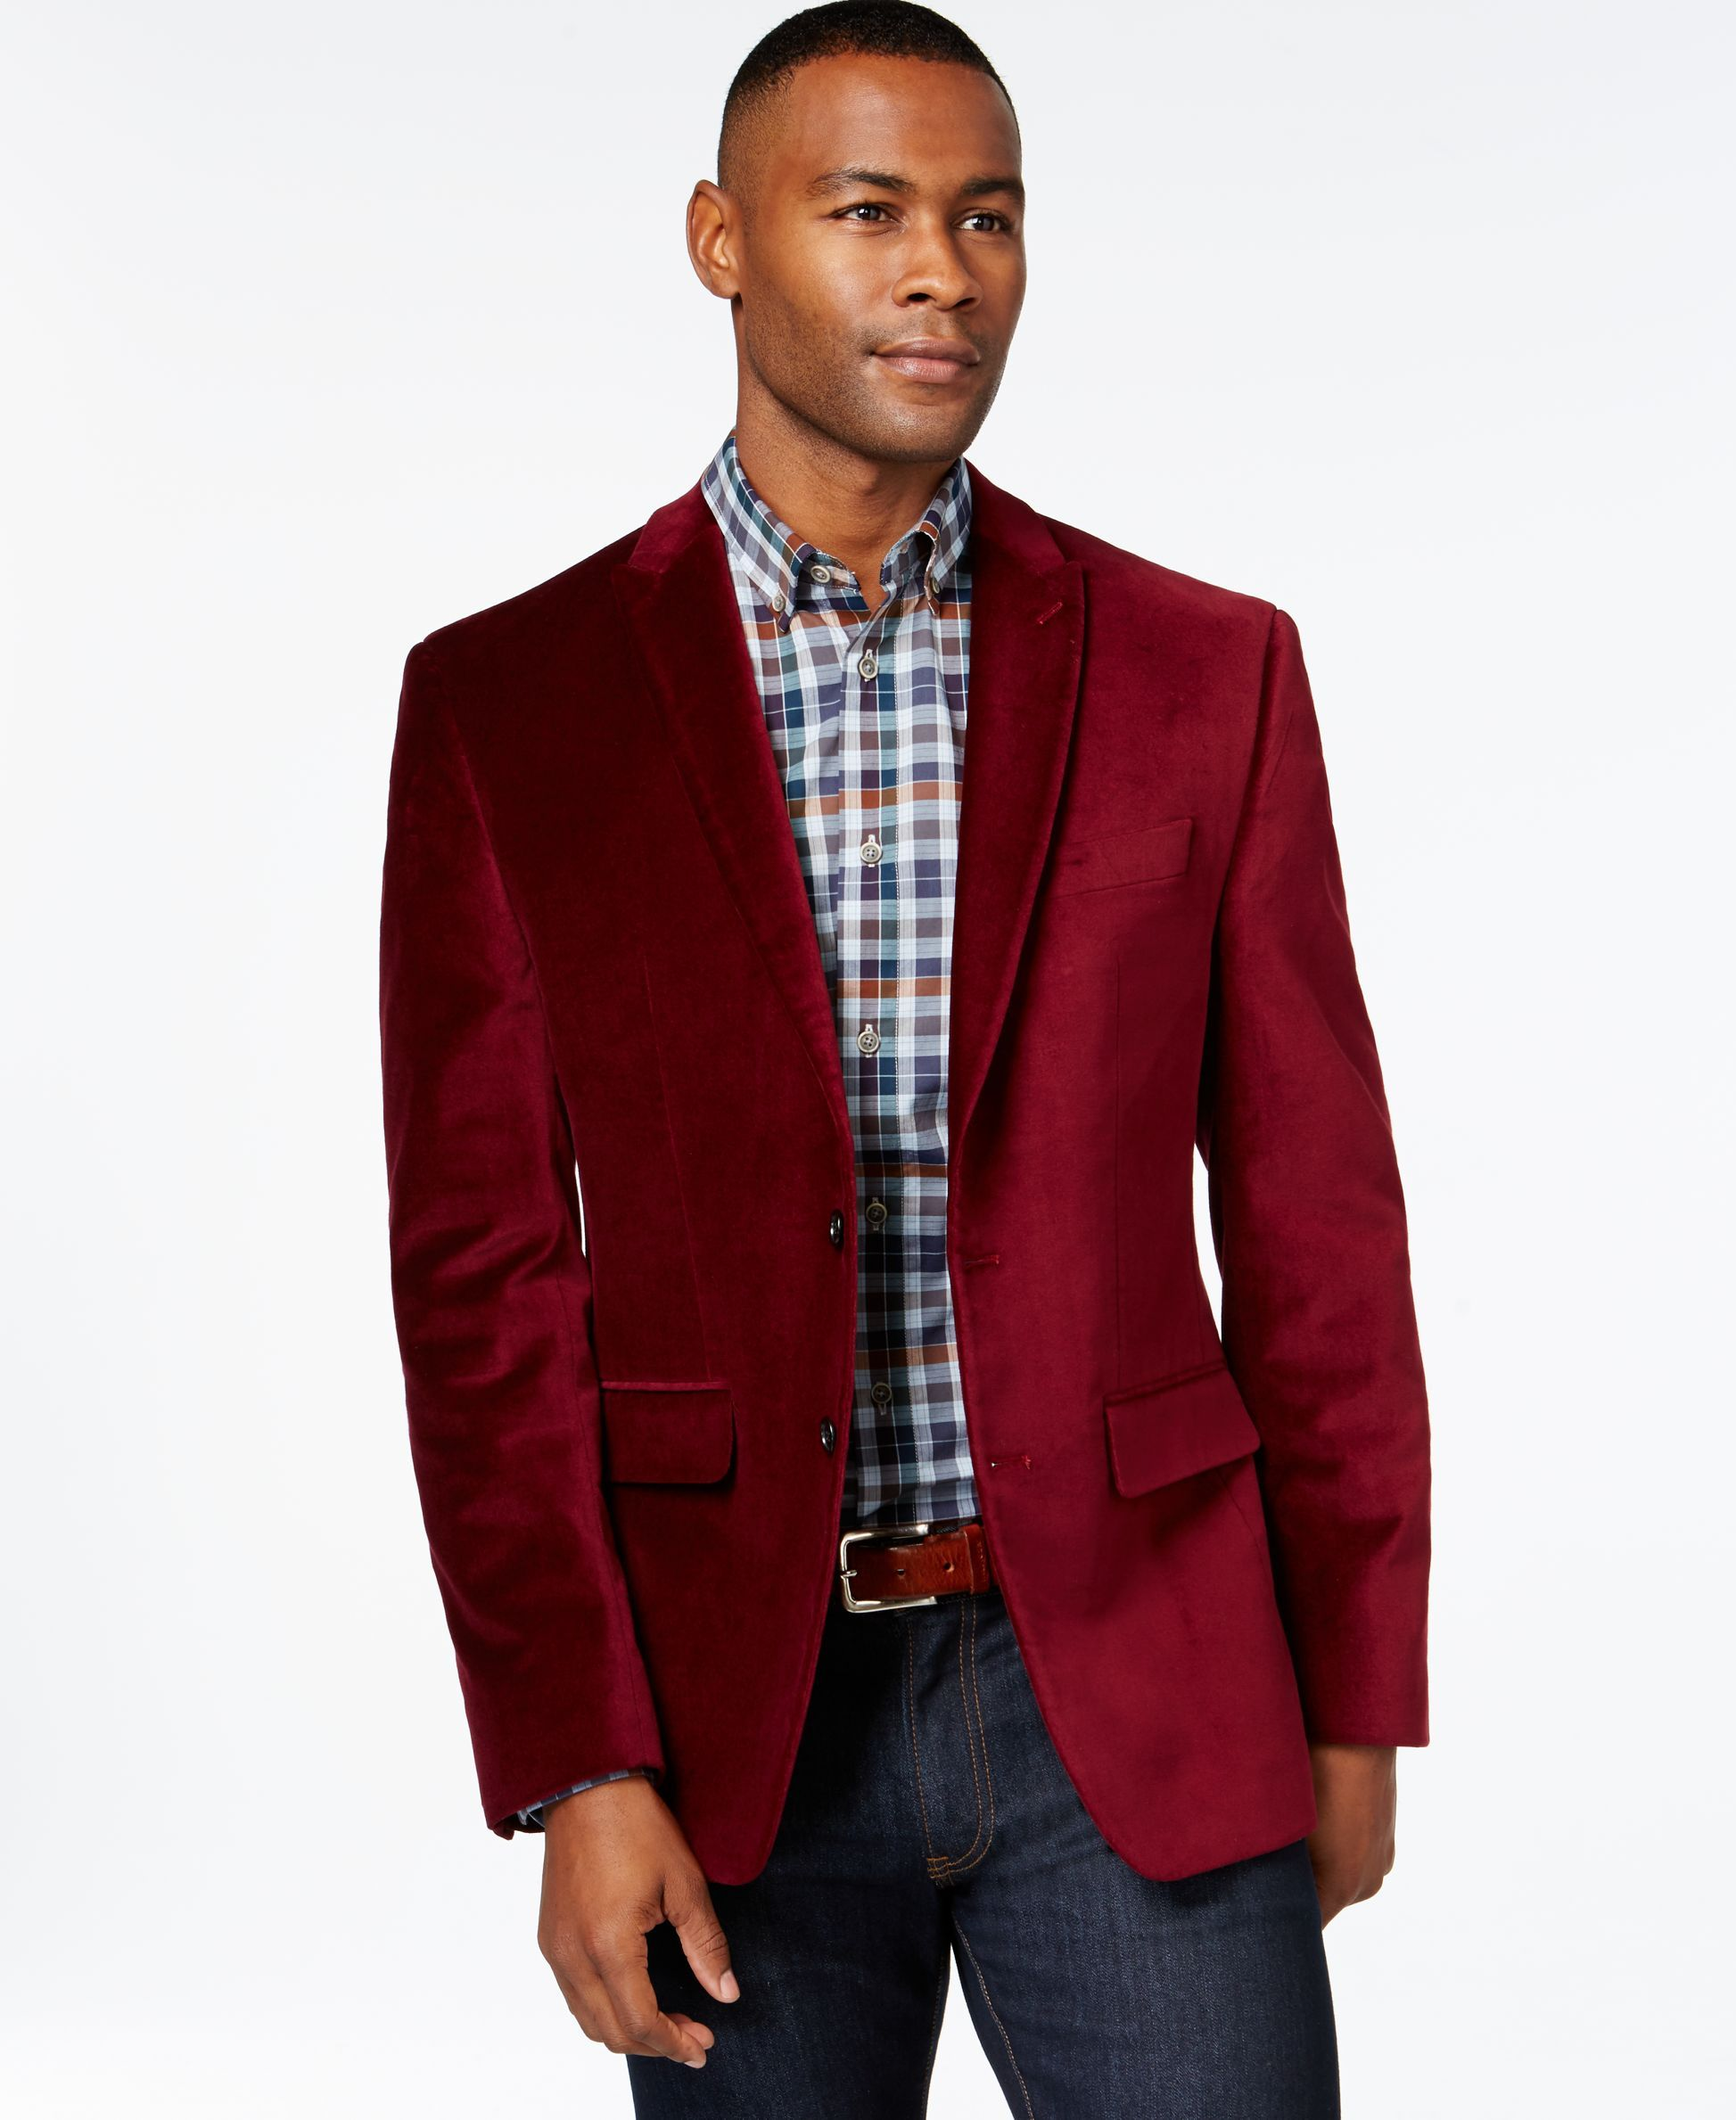 Argyle Culture Burgundy Velvet Blazer | Fashion Trends | Pinterest ...